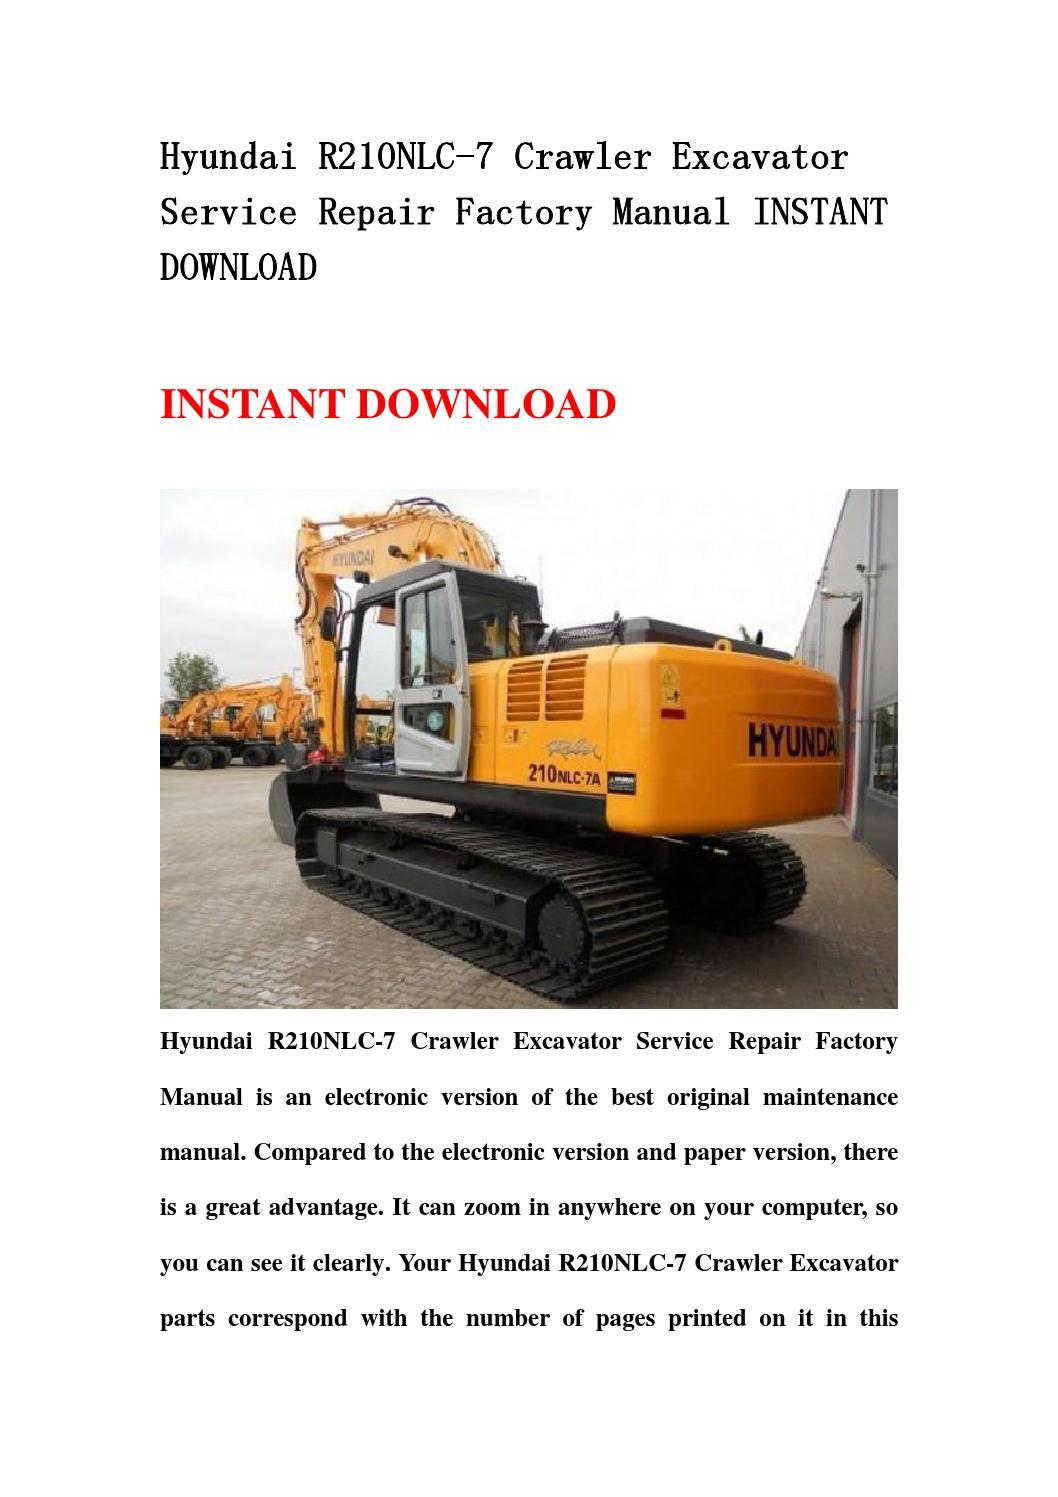 hyundai r210nlc 7 crawler excavator service repair factory